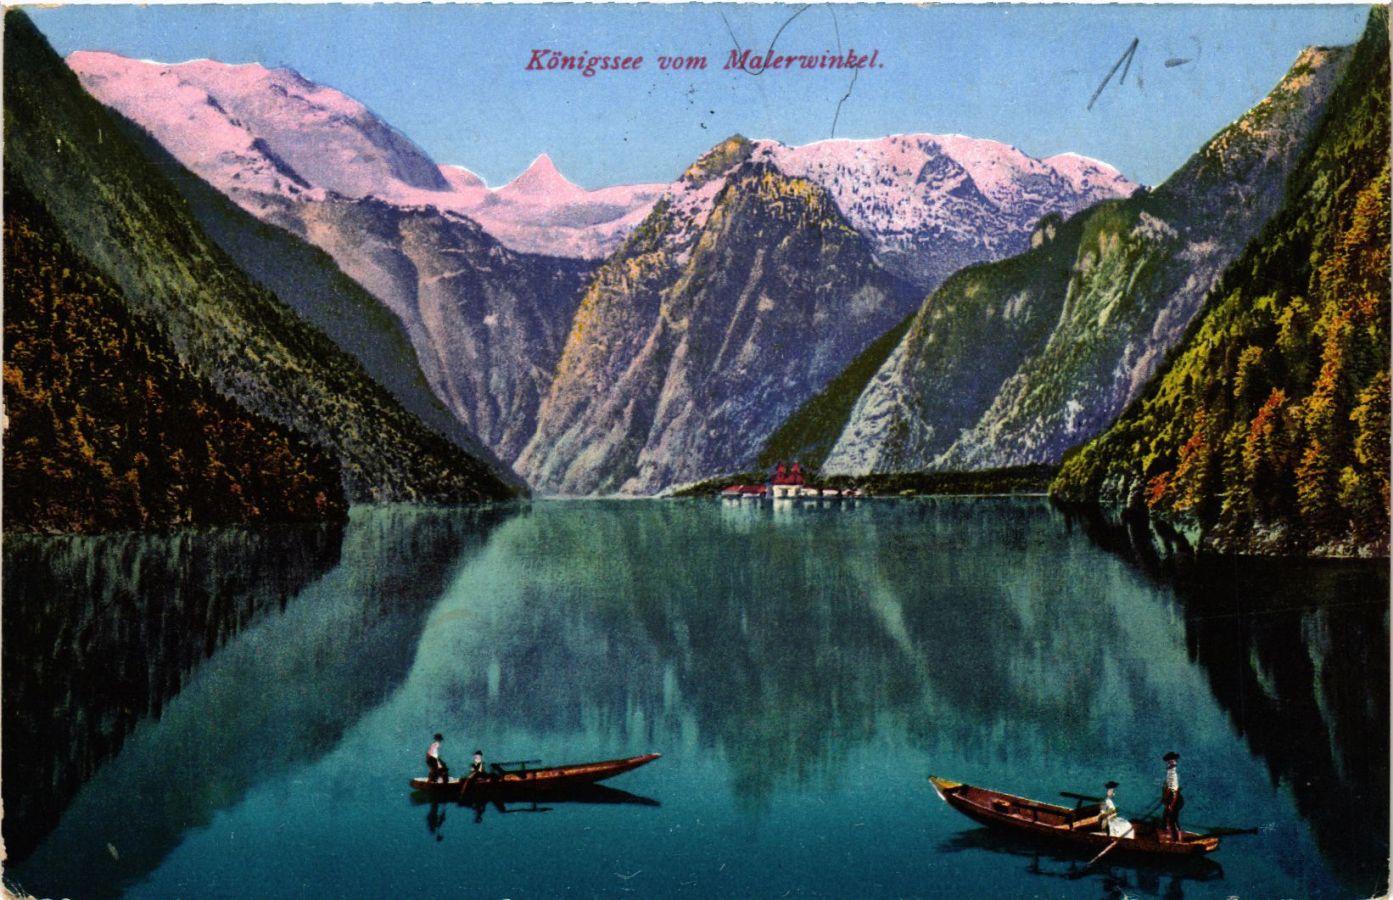 CPA-AK-Konigssee-vom-Malerwinkel-GERMANY-878982